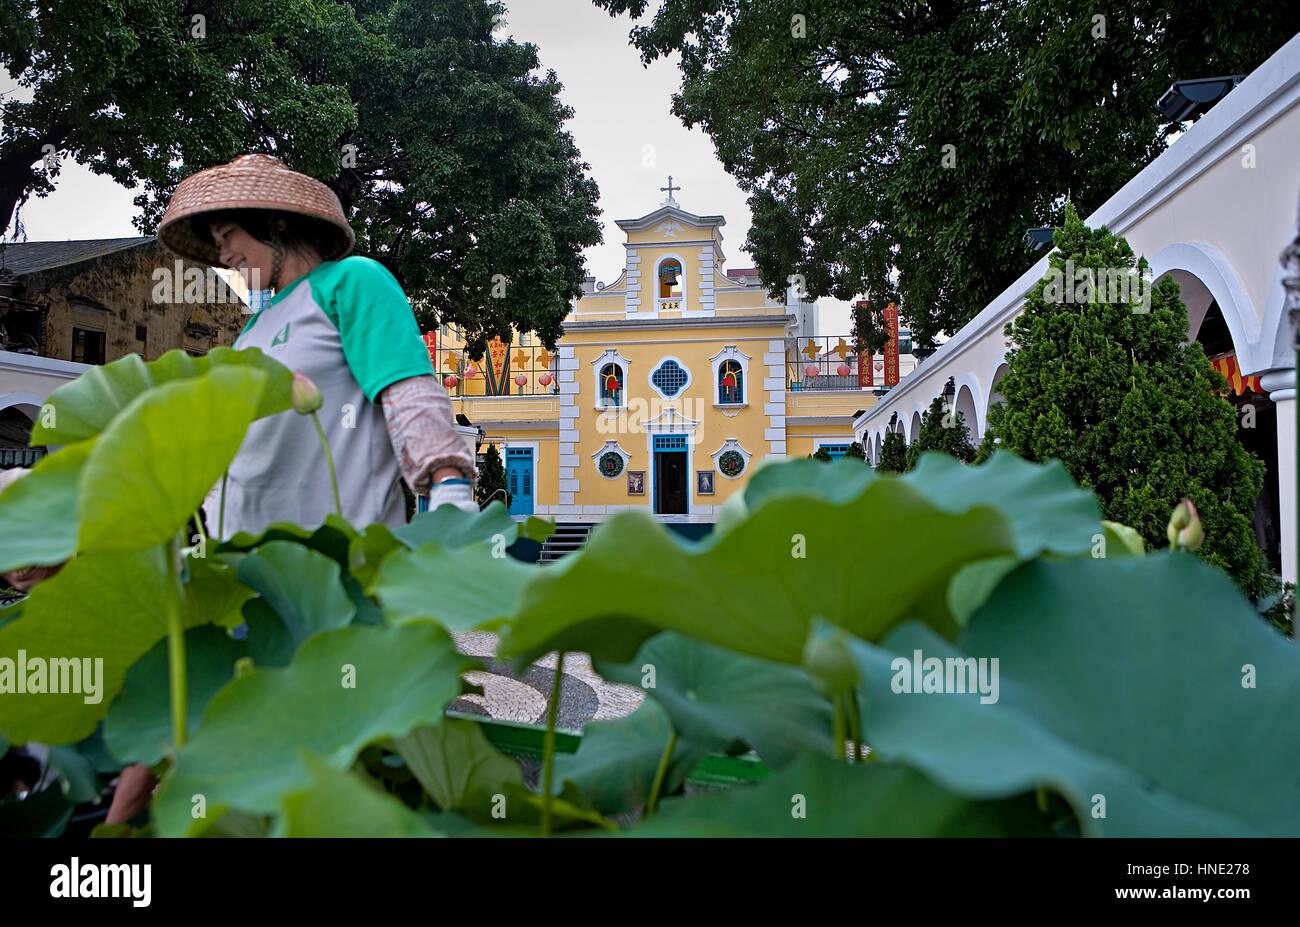 Saint Francis Xavier Chapel, Coloane island,Macau,China - Stock Image